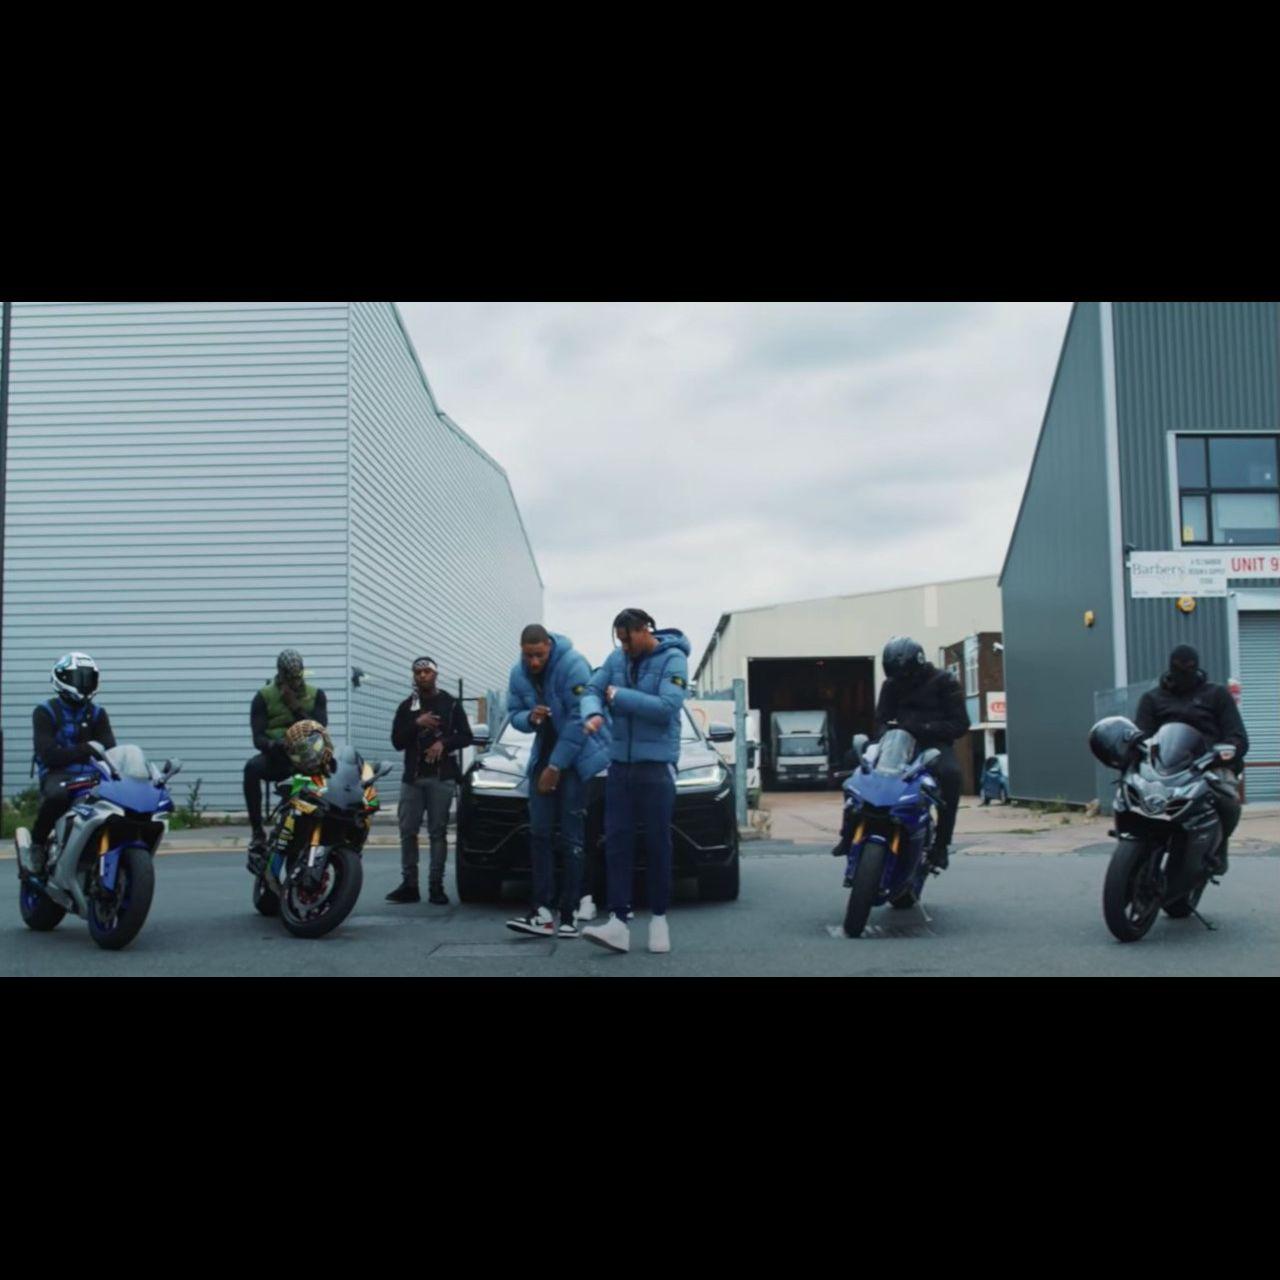 Dutchavelli - Bando Diaries (Remix) (ft. OneFour, Kekra, Noizy and Divine) (Thumbnail)